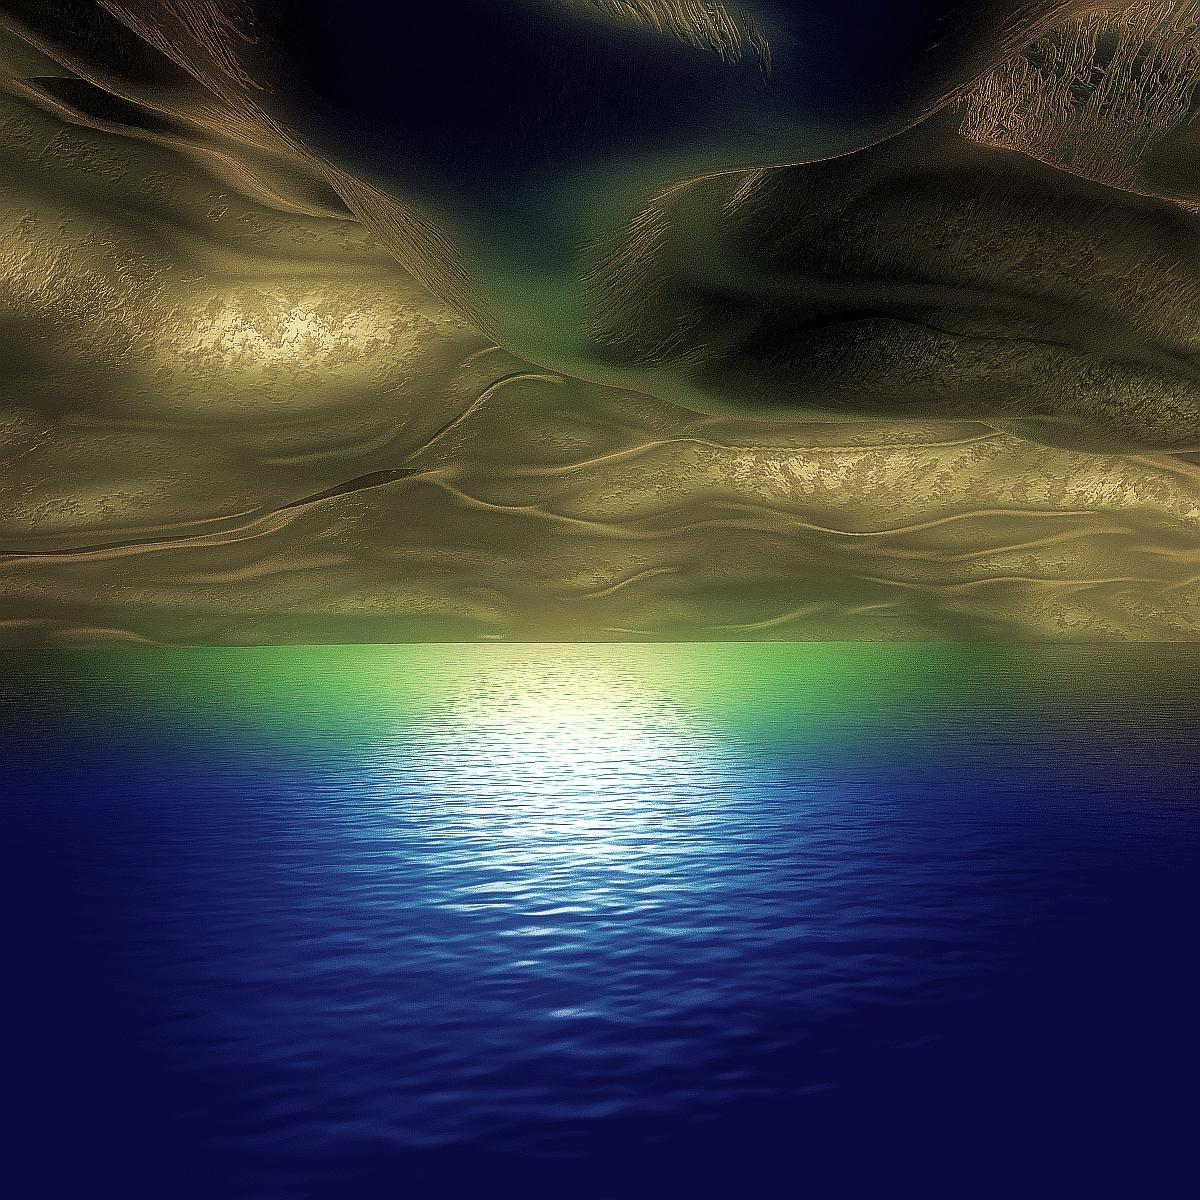 Daydream #17: The Way